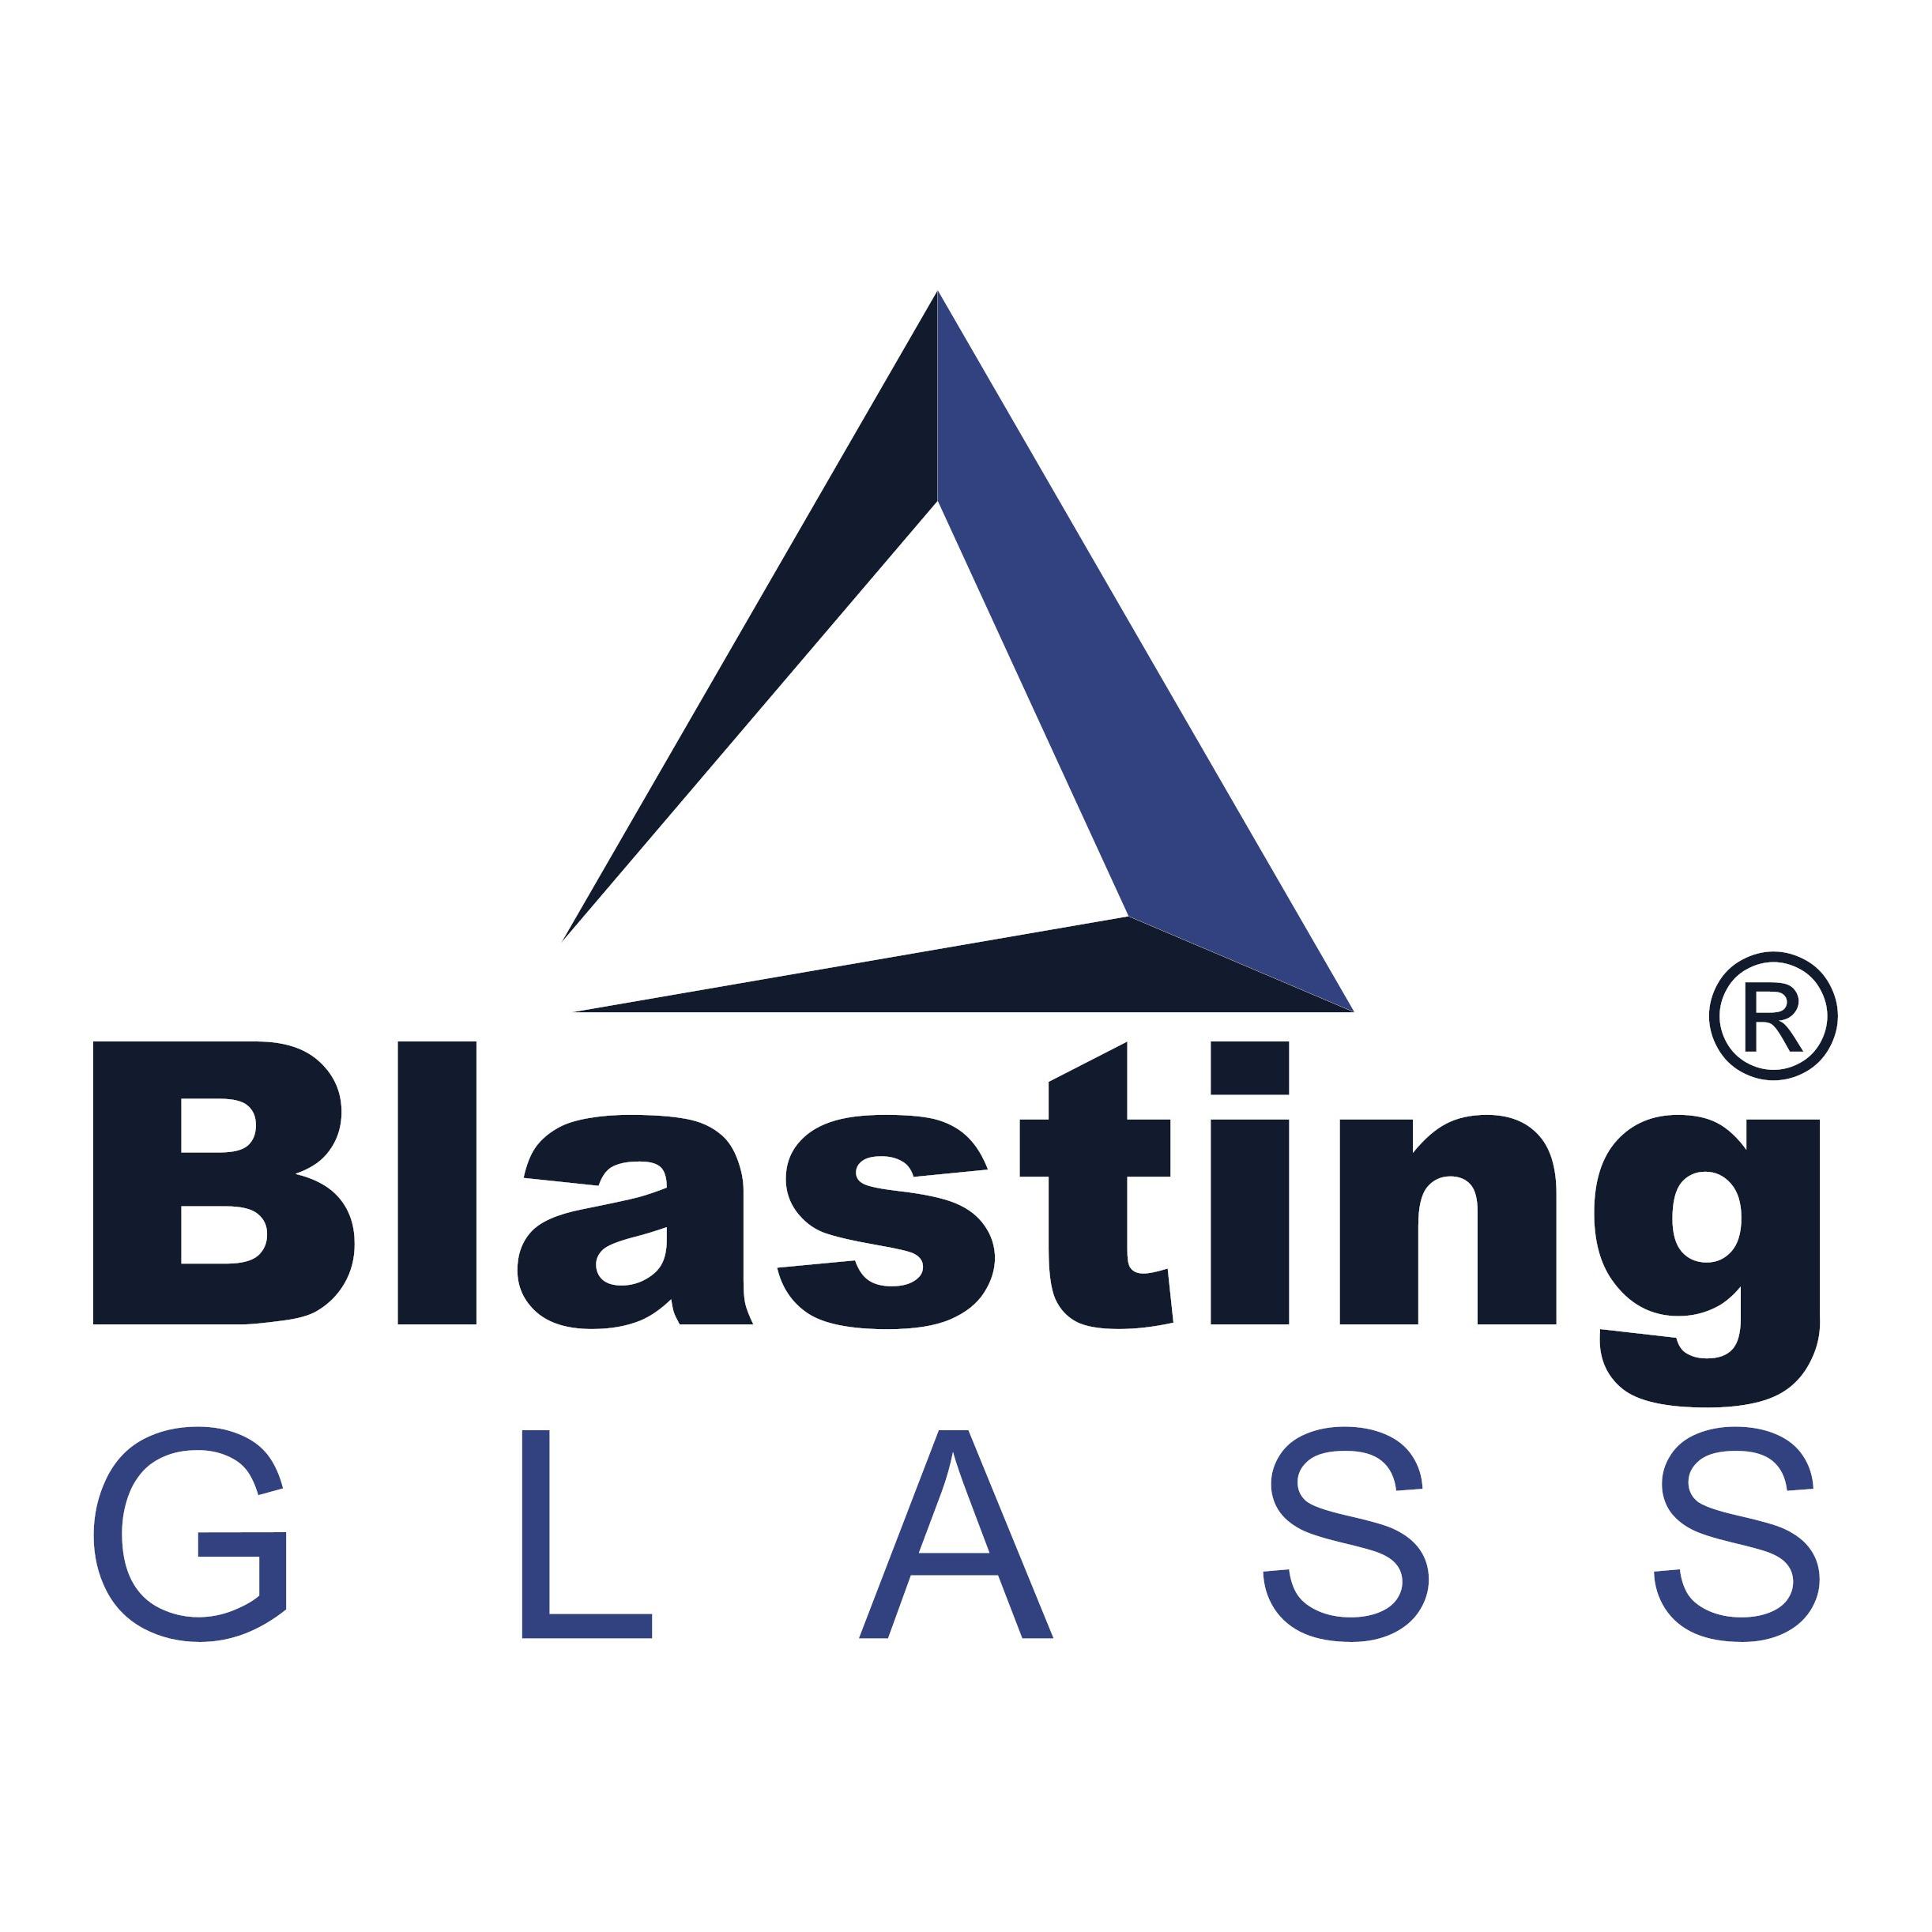 BLASTING GLASS